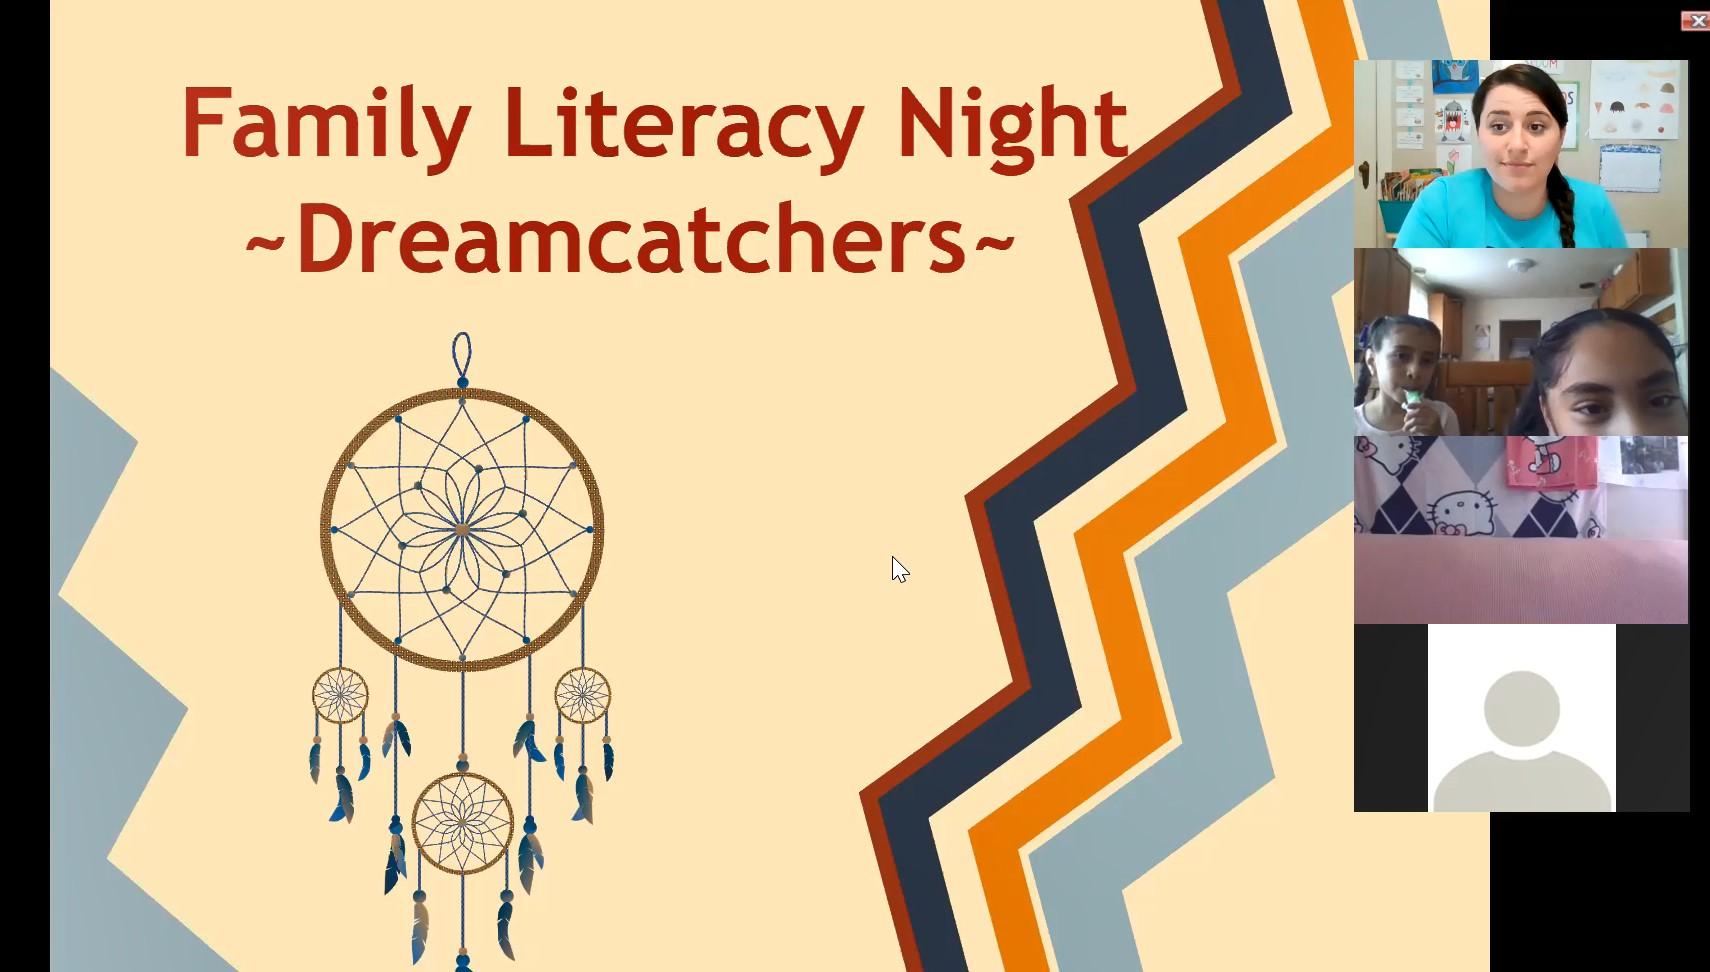 Family Literacy Night-Dreamcatchers